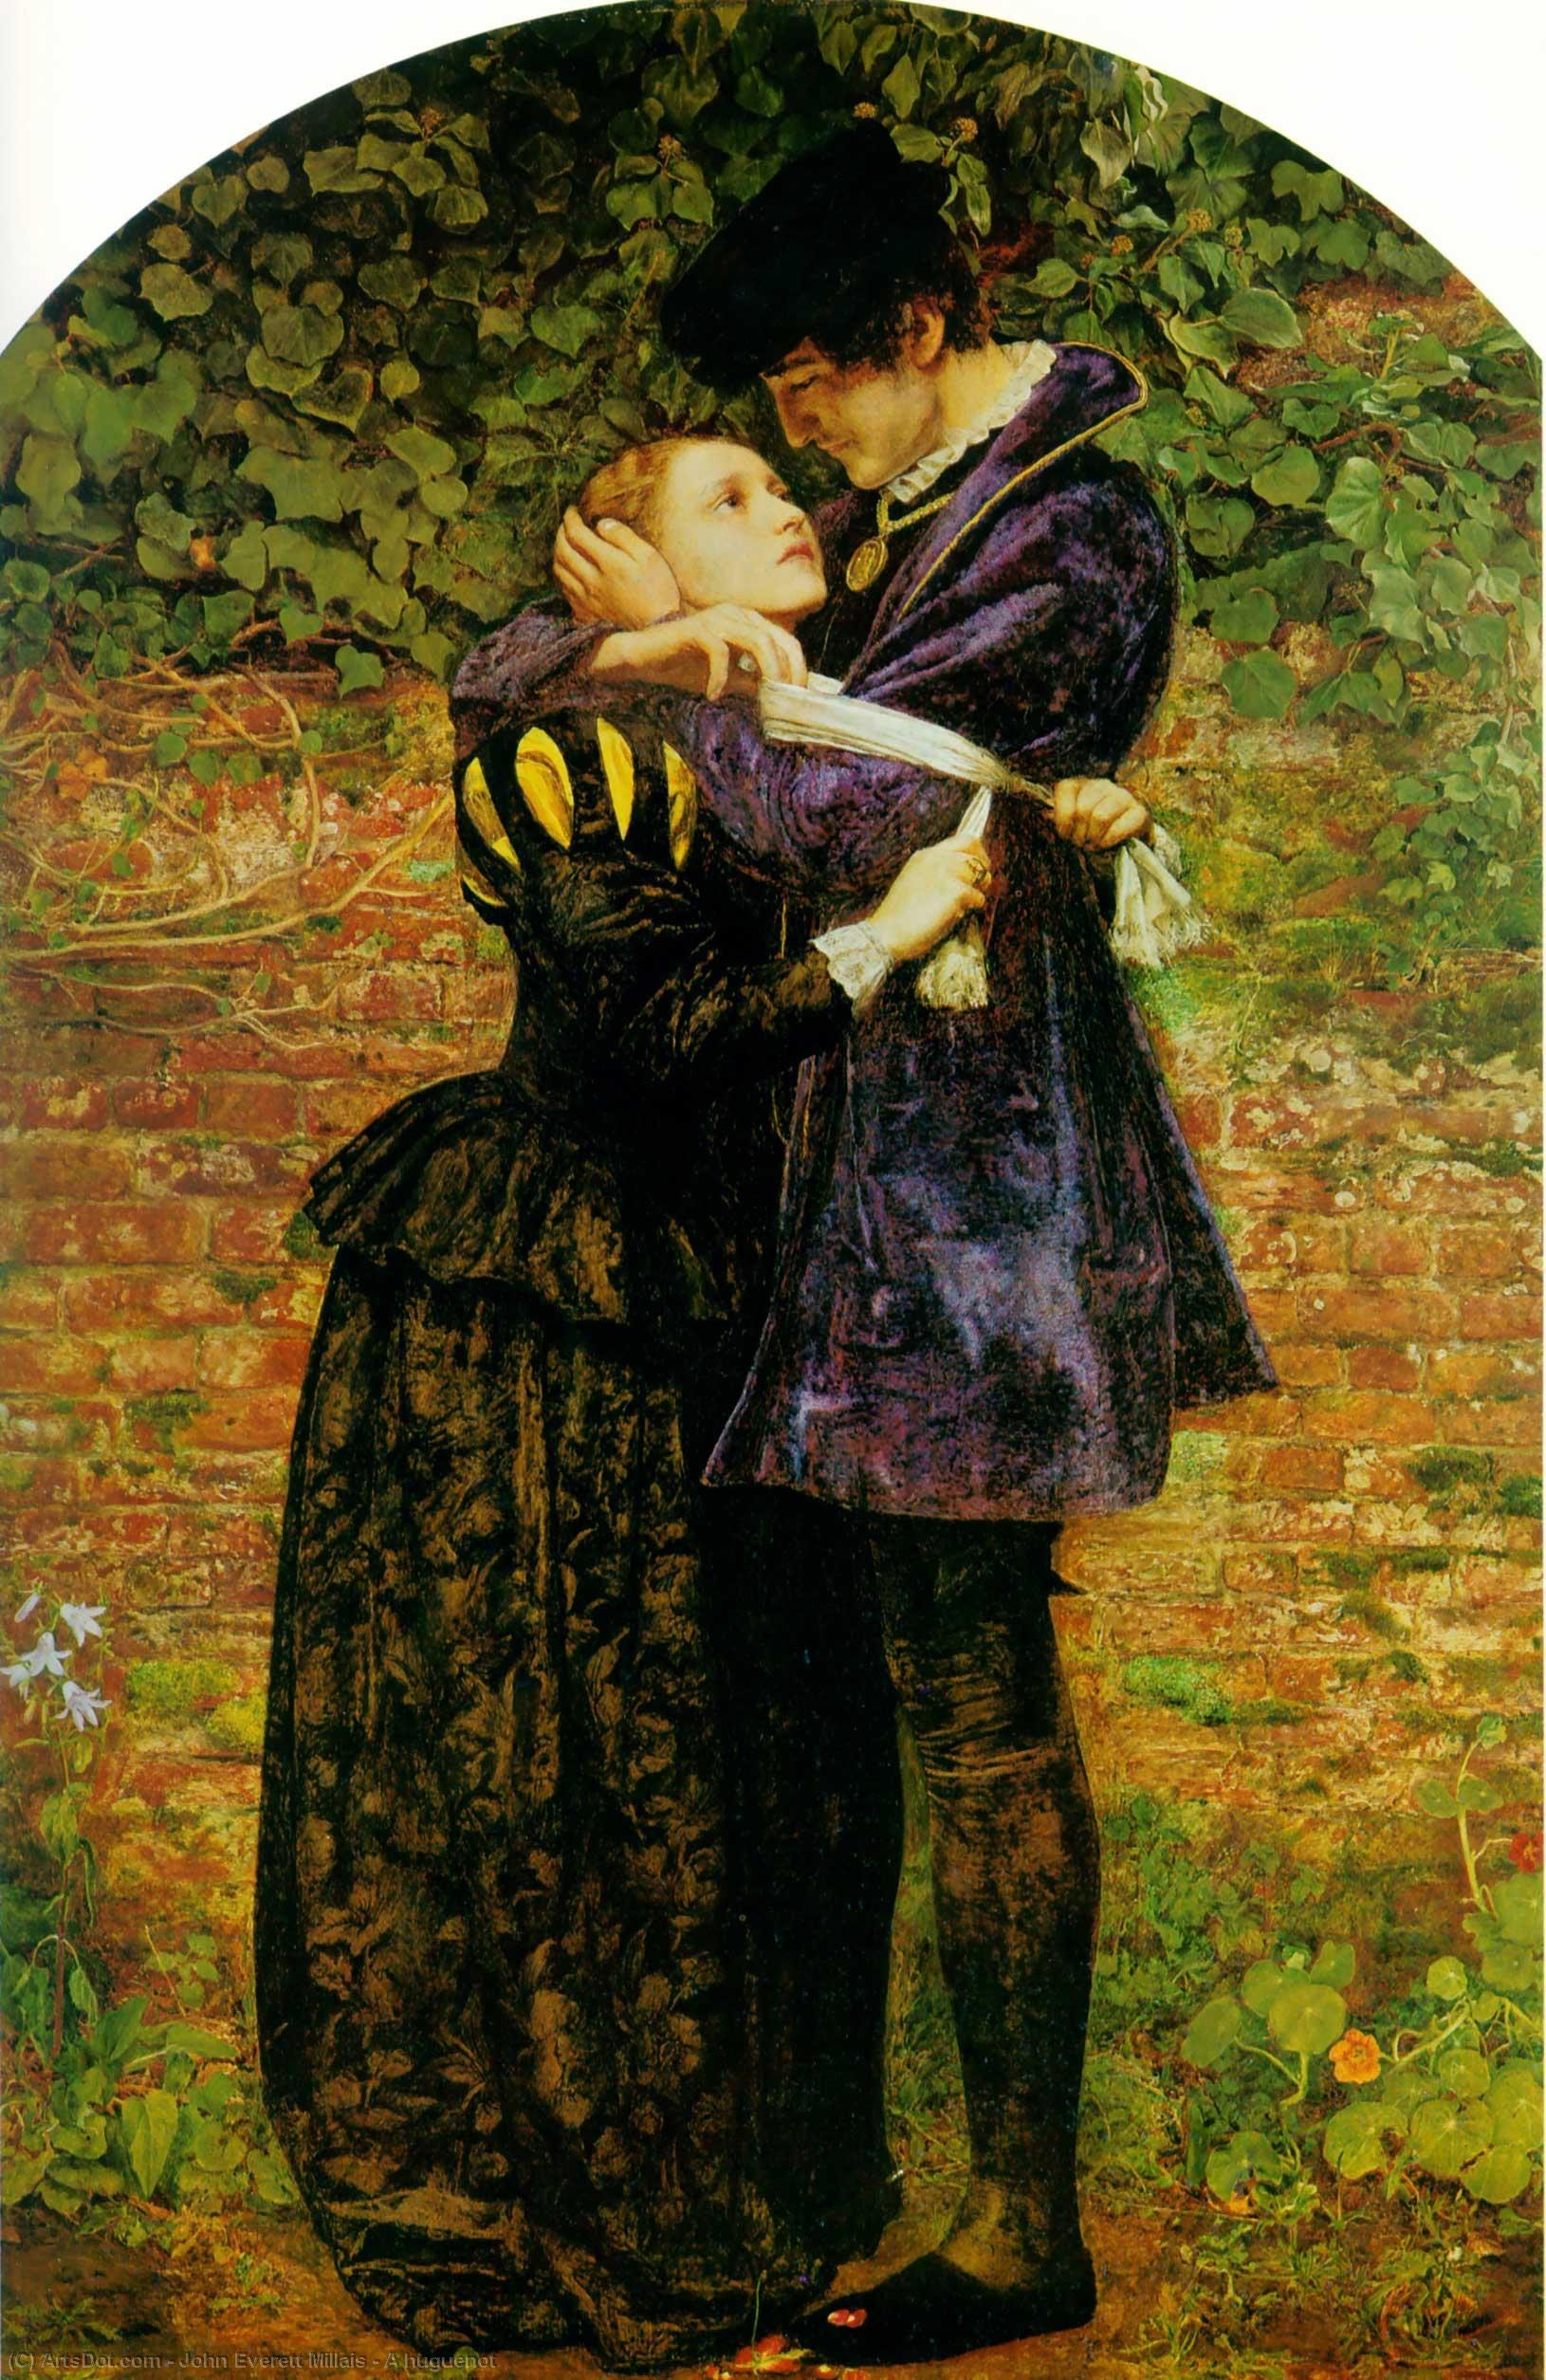 Wikioo.org - The Encyclopedia of Fine Arts - Painting, Artwork by John Everett Millais - A huguenot